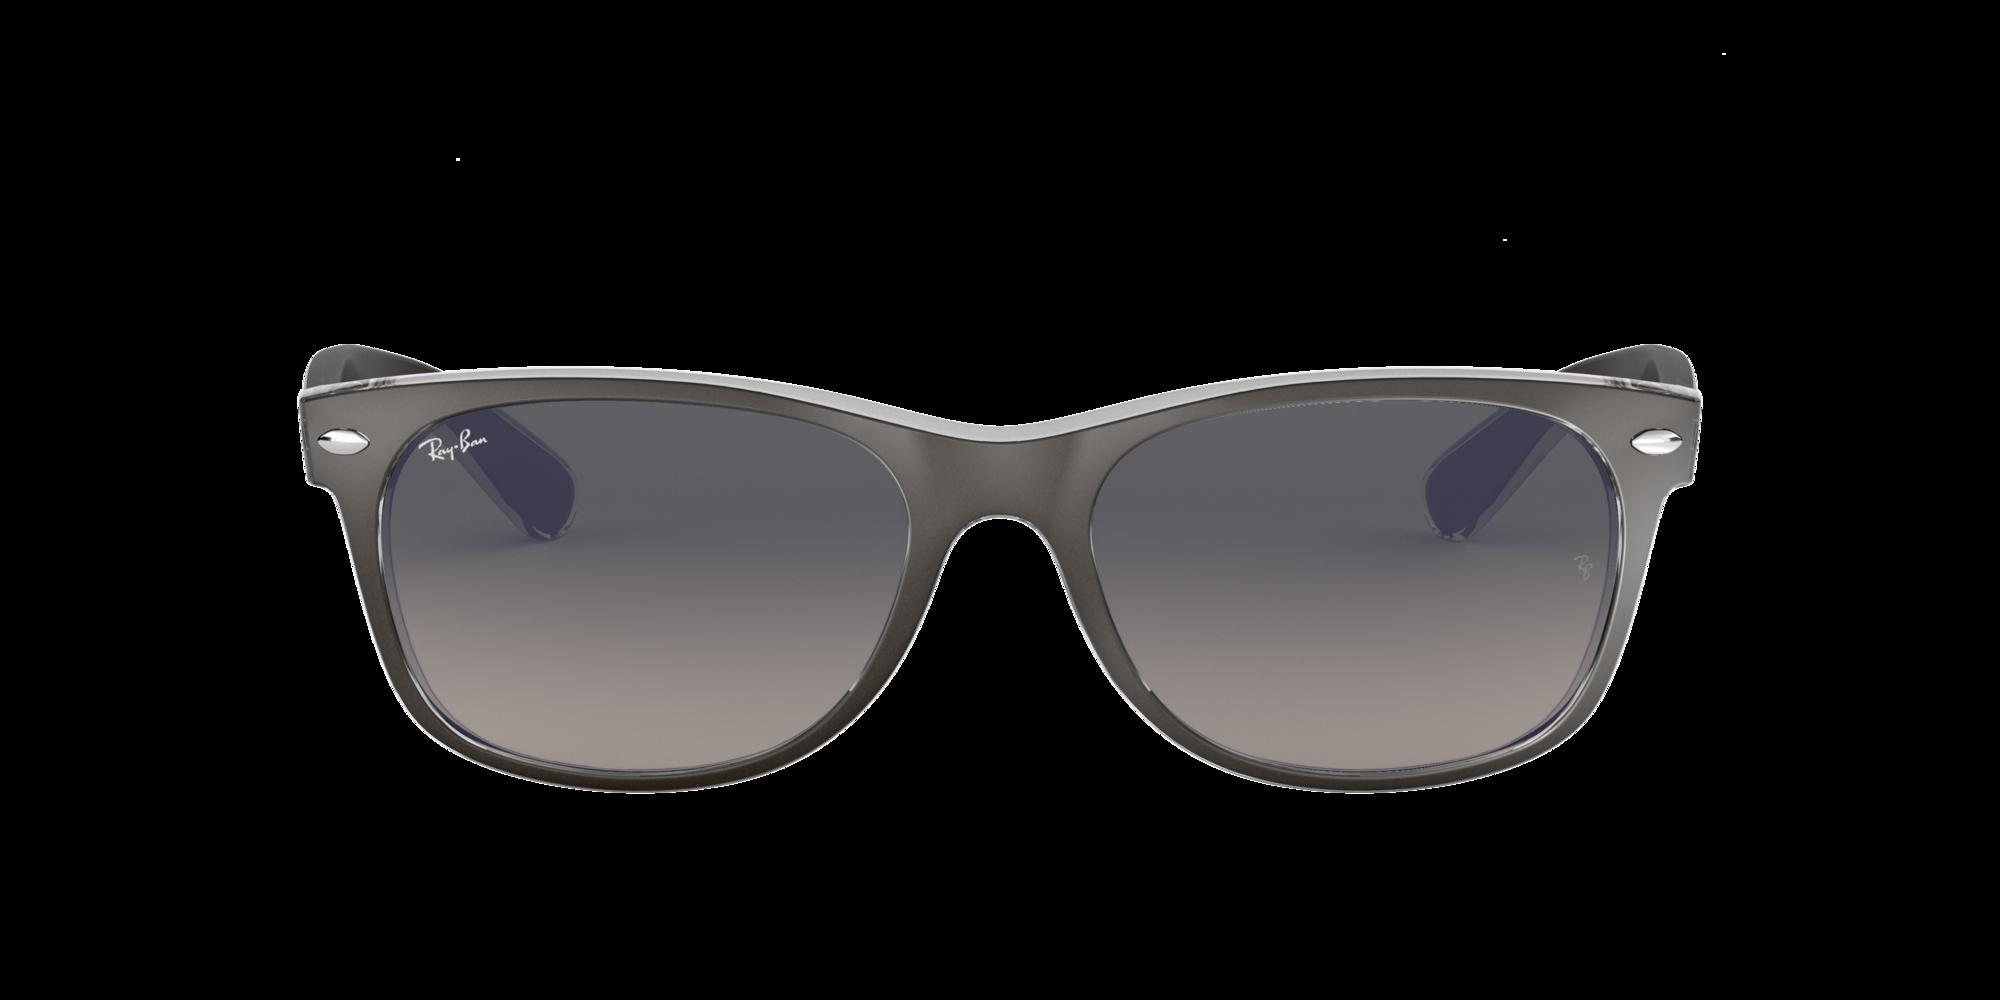 Image for RB2132 55 NEW WAYFARER from LensCrafters   Glasses, Prescription Glasses Online, Eyewear